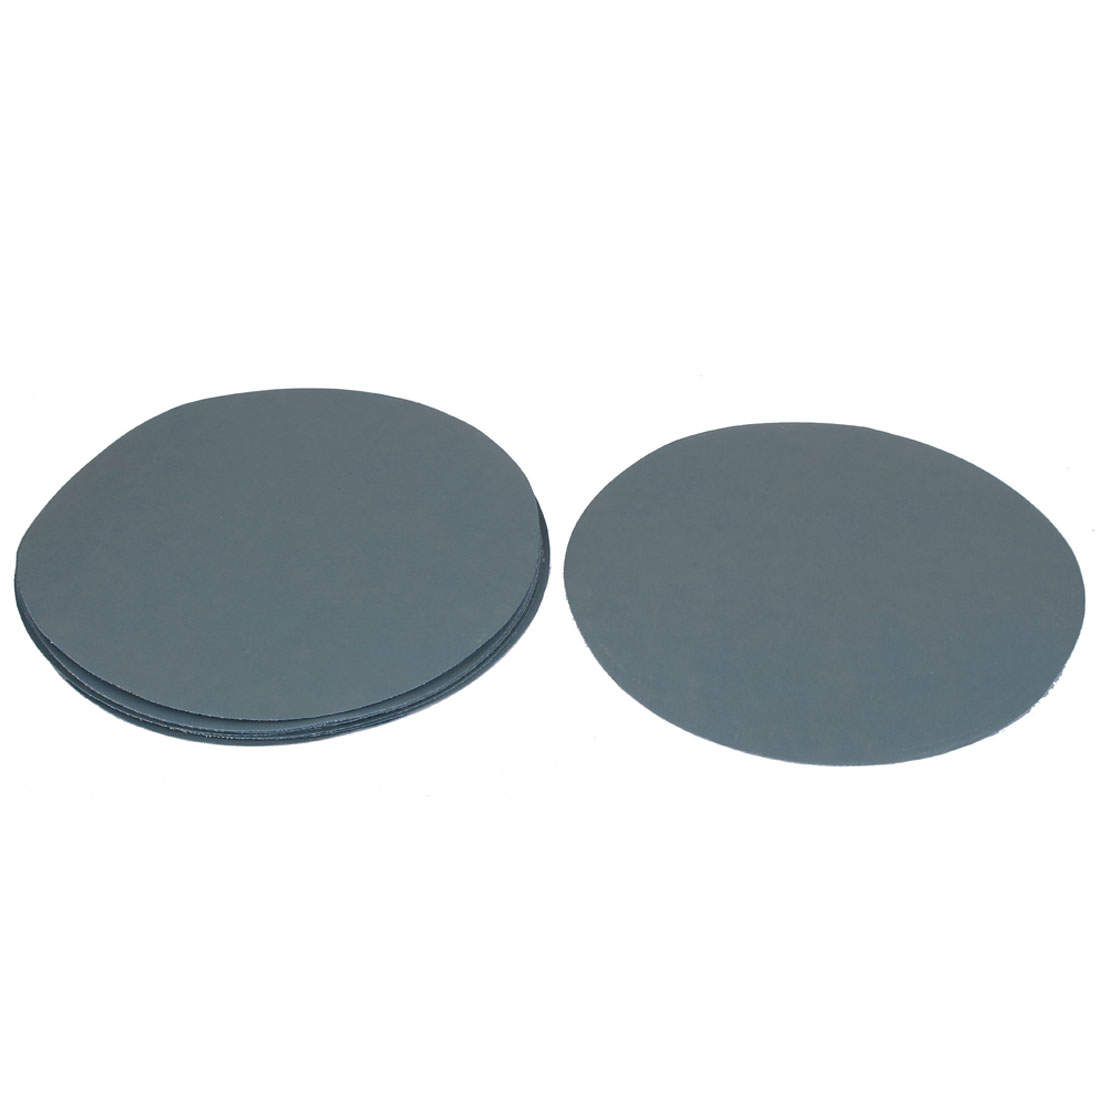 "8"" Dia Wet Dry Silicone Carbide 3000 Grit Polishing Sand Paper 10pcs"